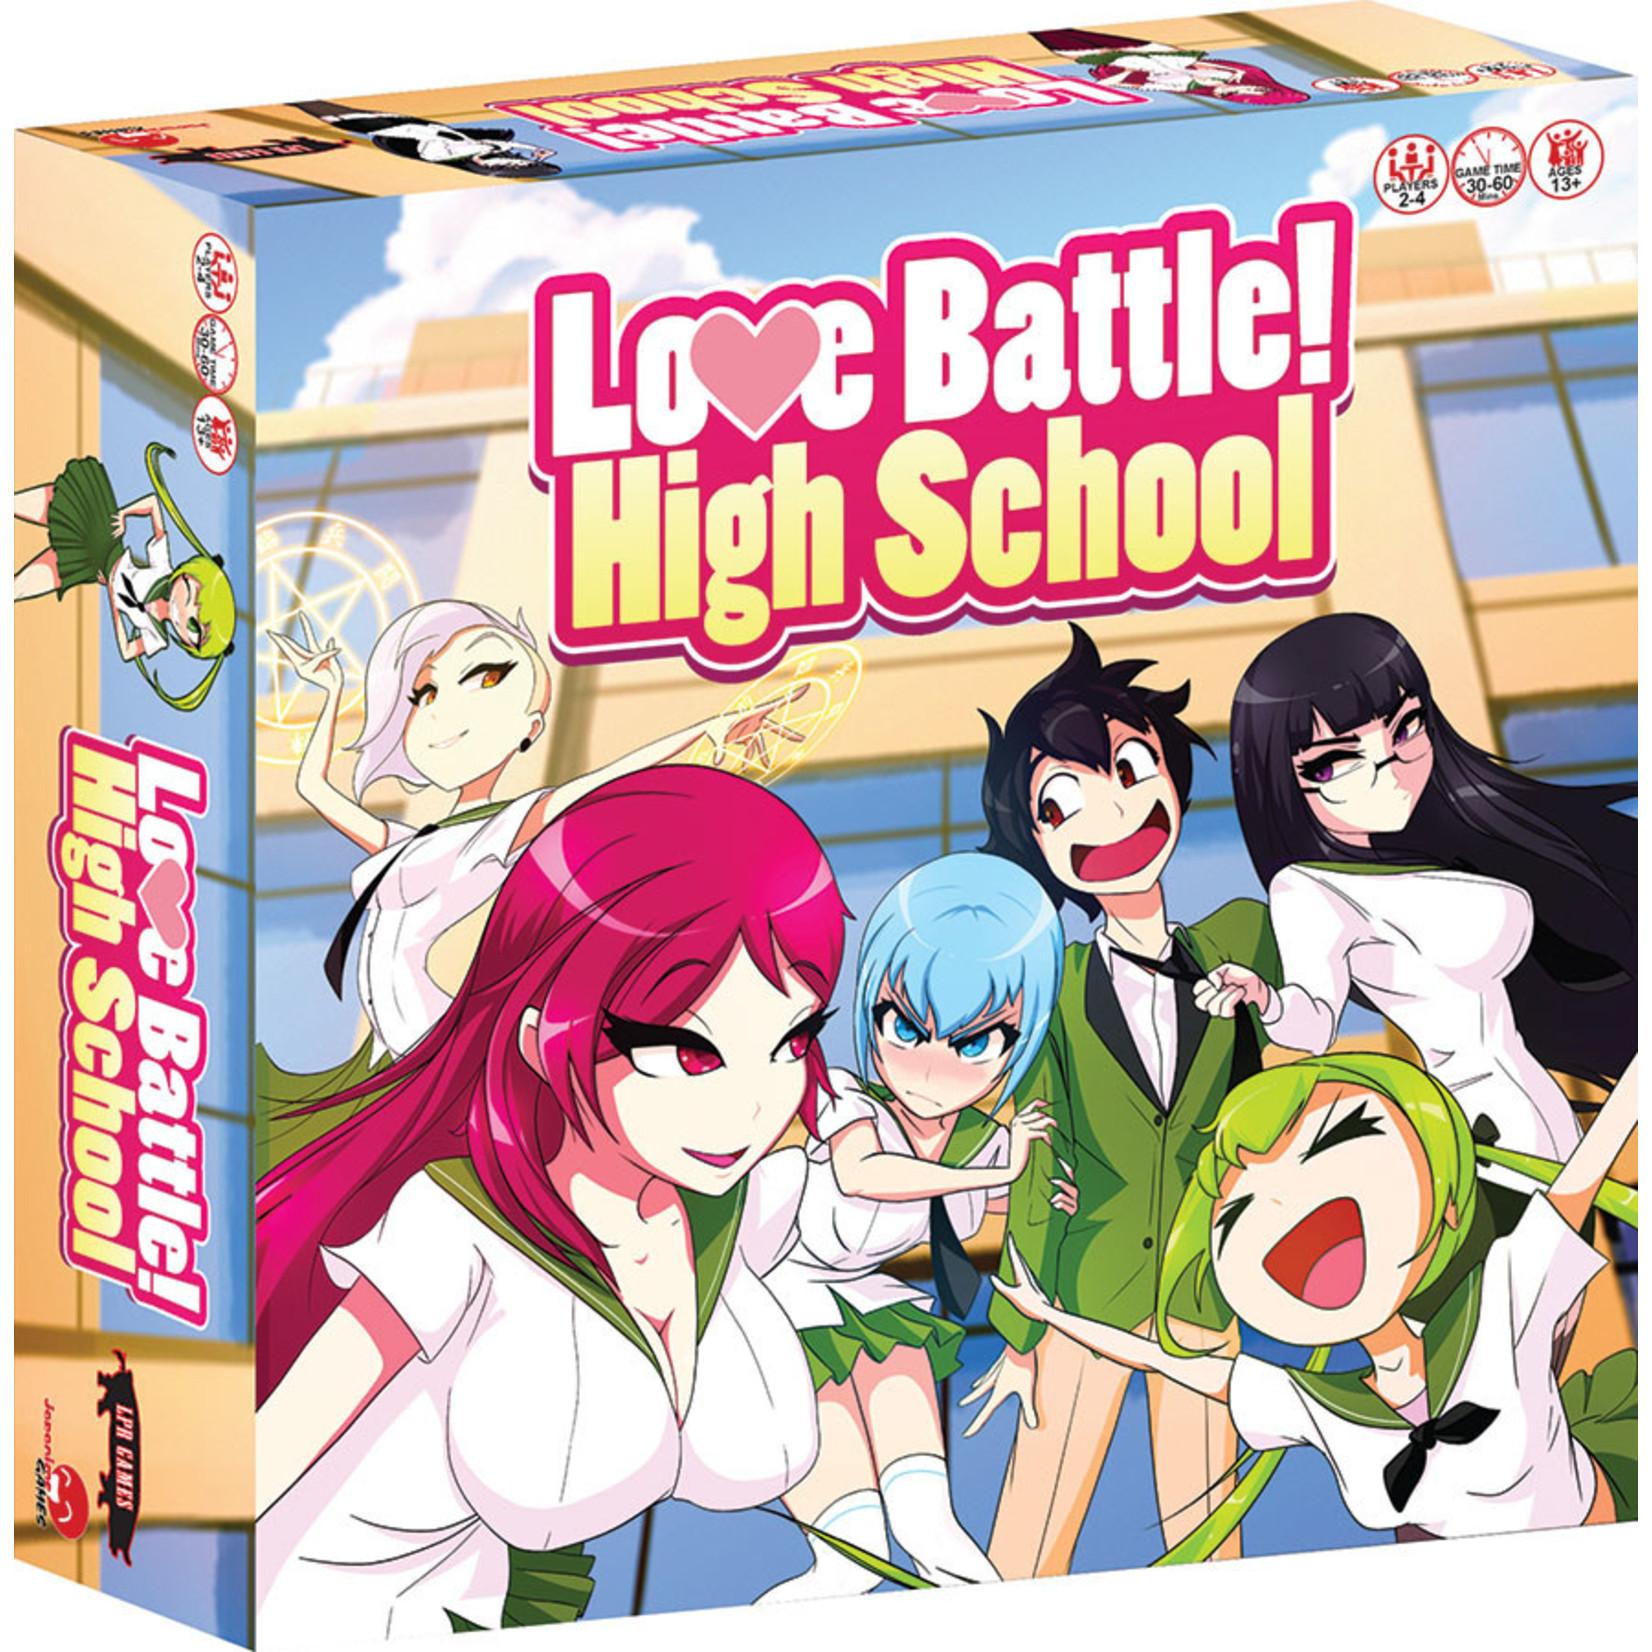 Japanime Games Love Battle High School